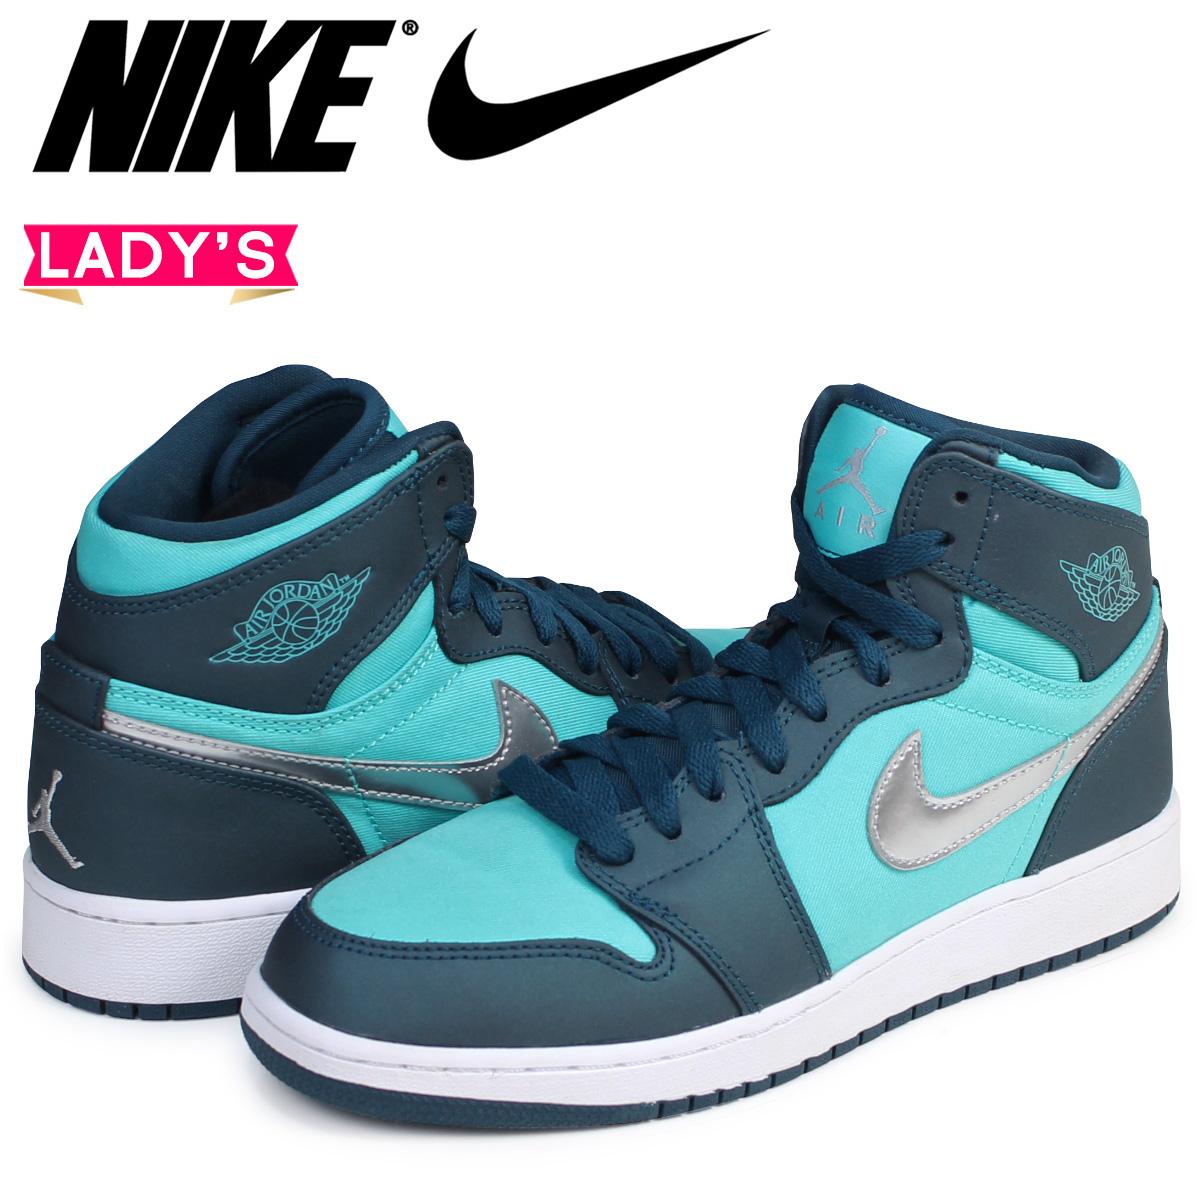 4a18ab8f2988 Sugar Online Shop  Nike NIKE Air Jordan 1 nostalgic lady s sneakers AIR  JORDAN 1 RETRO HIGH GS 332